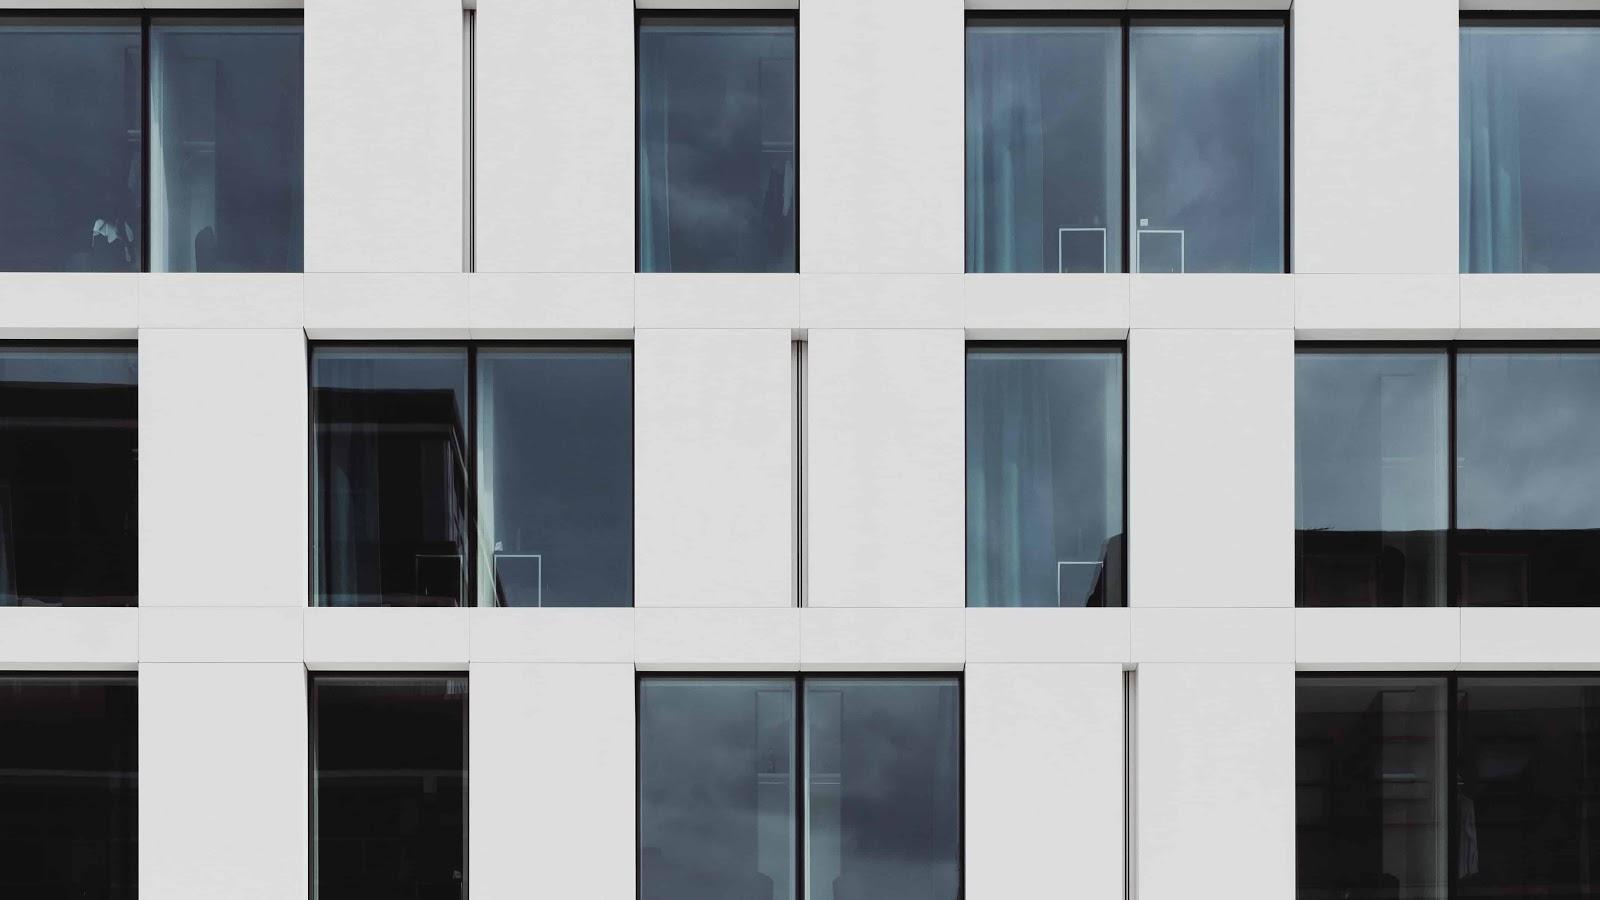 offfice windows